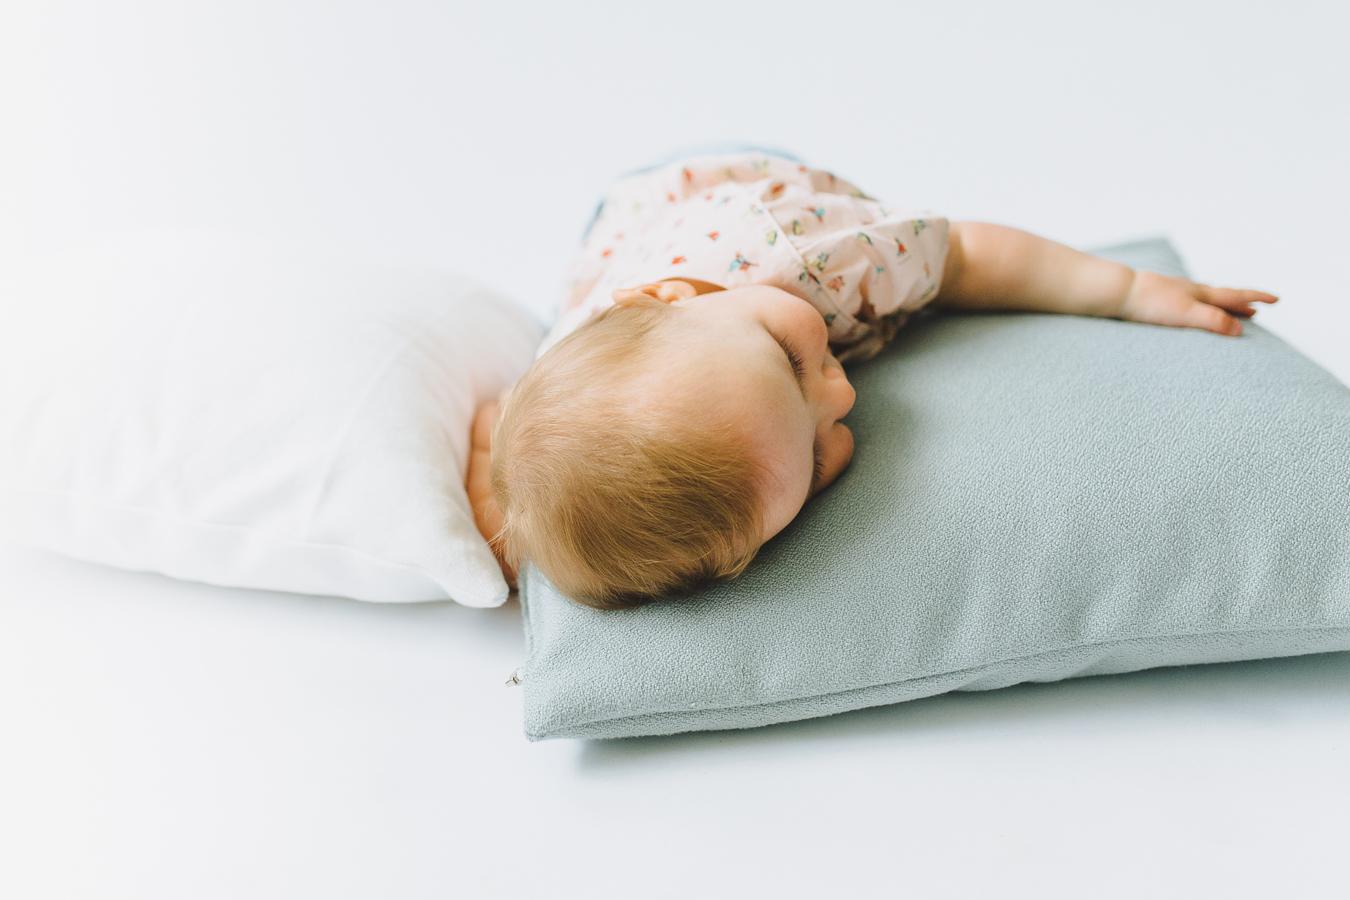 Baby-Lifestyle-Photographer-Portrait-13.jpg